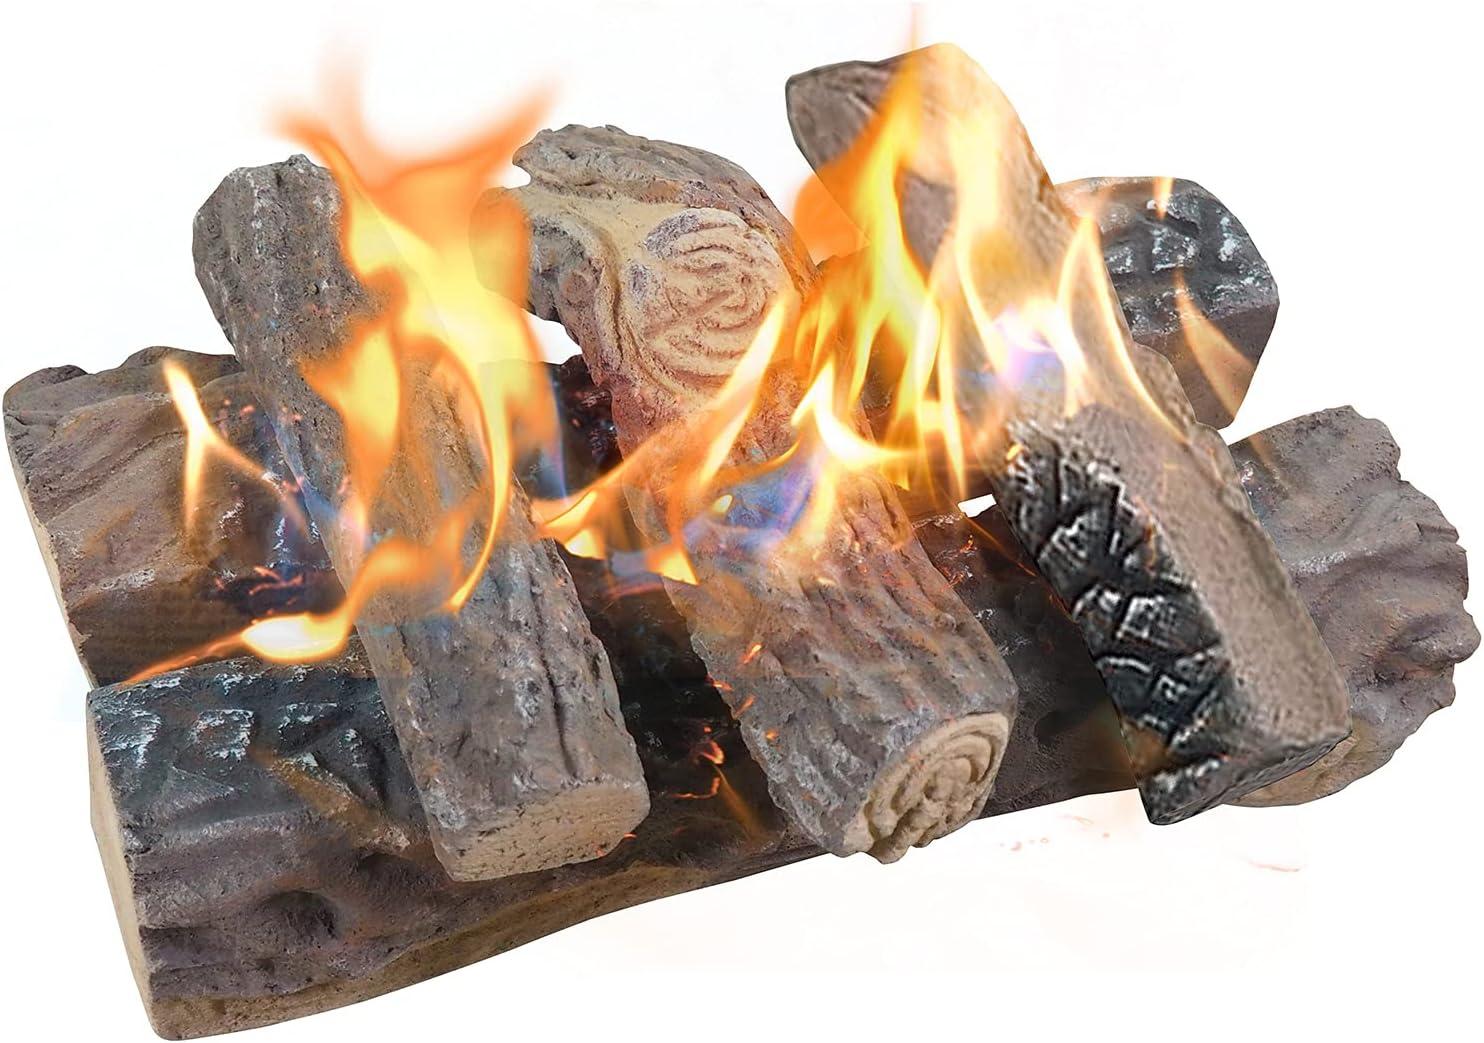 Buy ATR ART TO REAL Large Gas Fireplace Logs, Set of 20 Ceramic ...